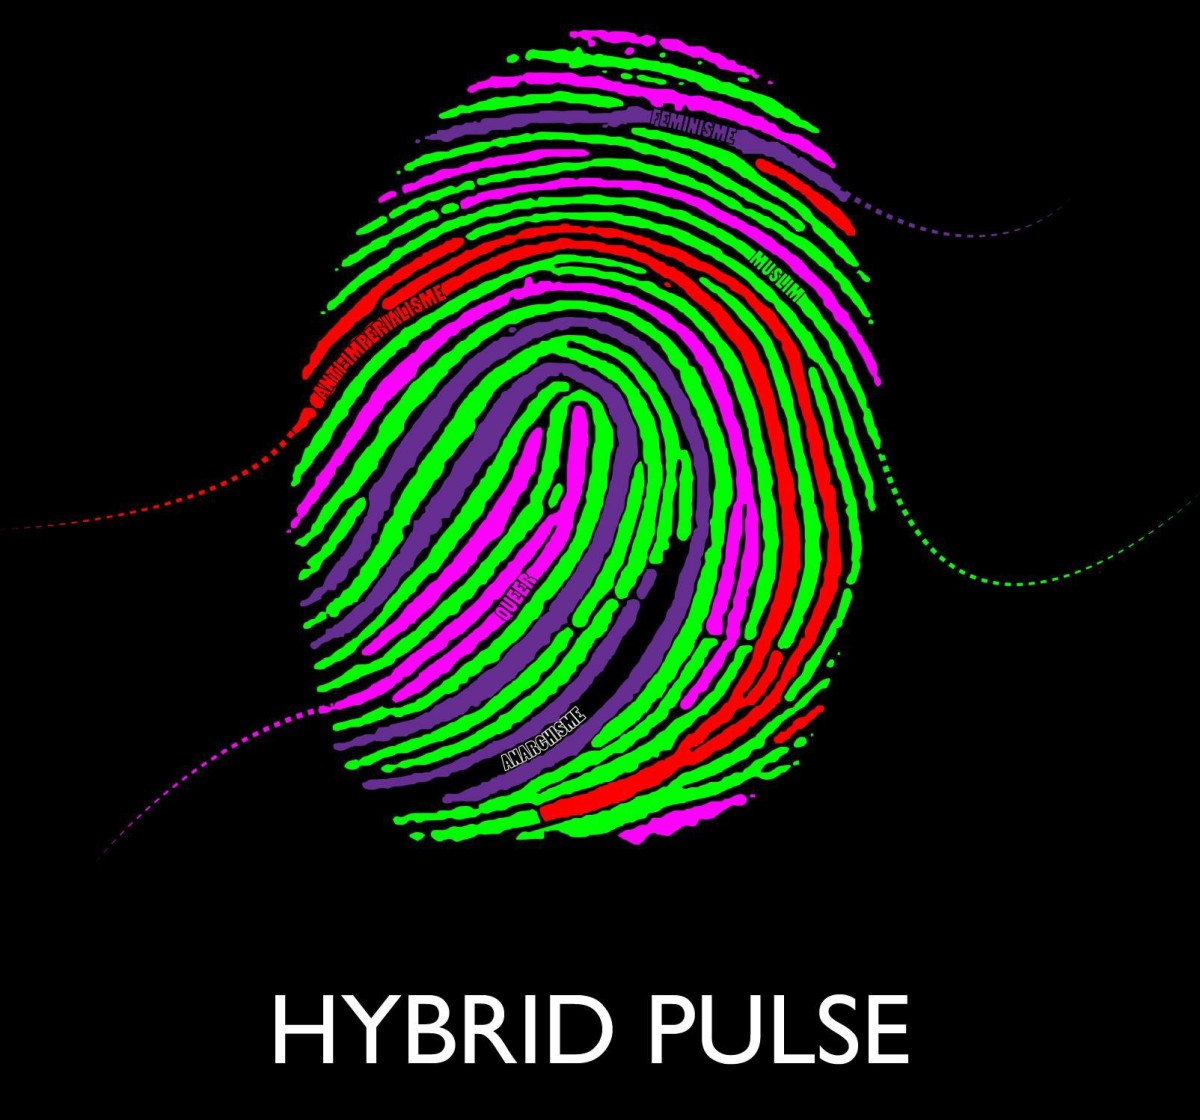 E COMME ENTRETIEN -Hybrid pulse. Francesca Gemelli et AlexandraDols